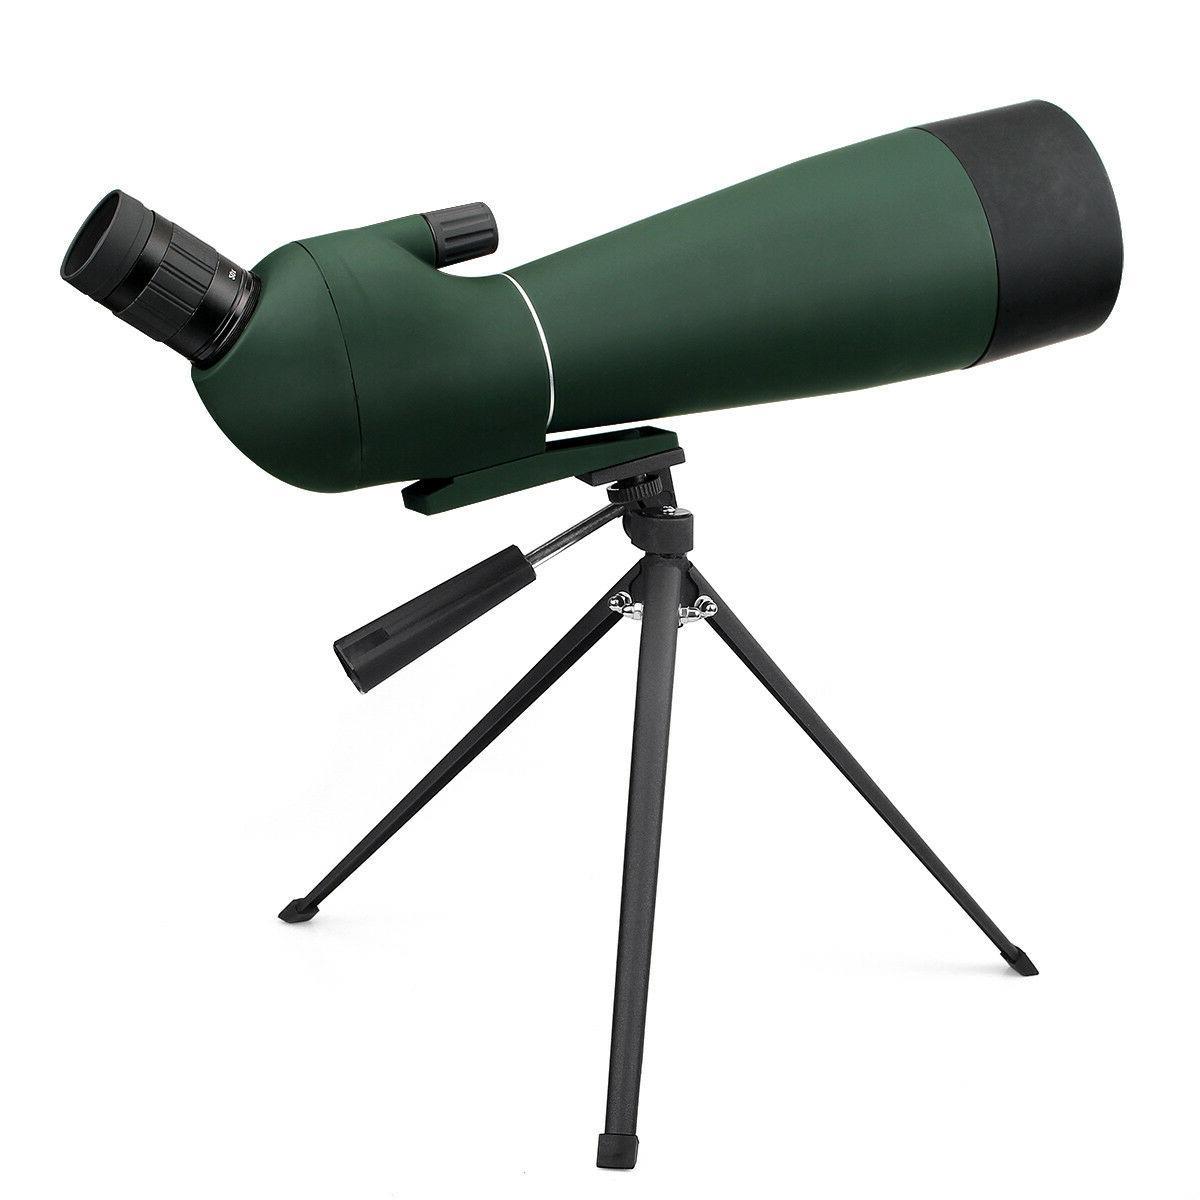 SVBONY 20-60x80 Spotting Scope BAK4 Bird Adapter US